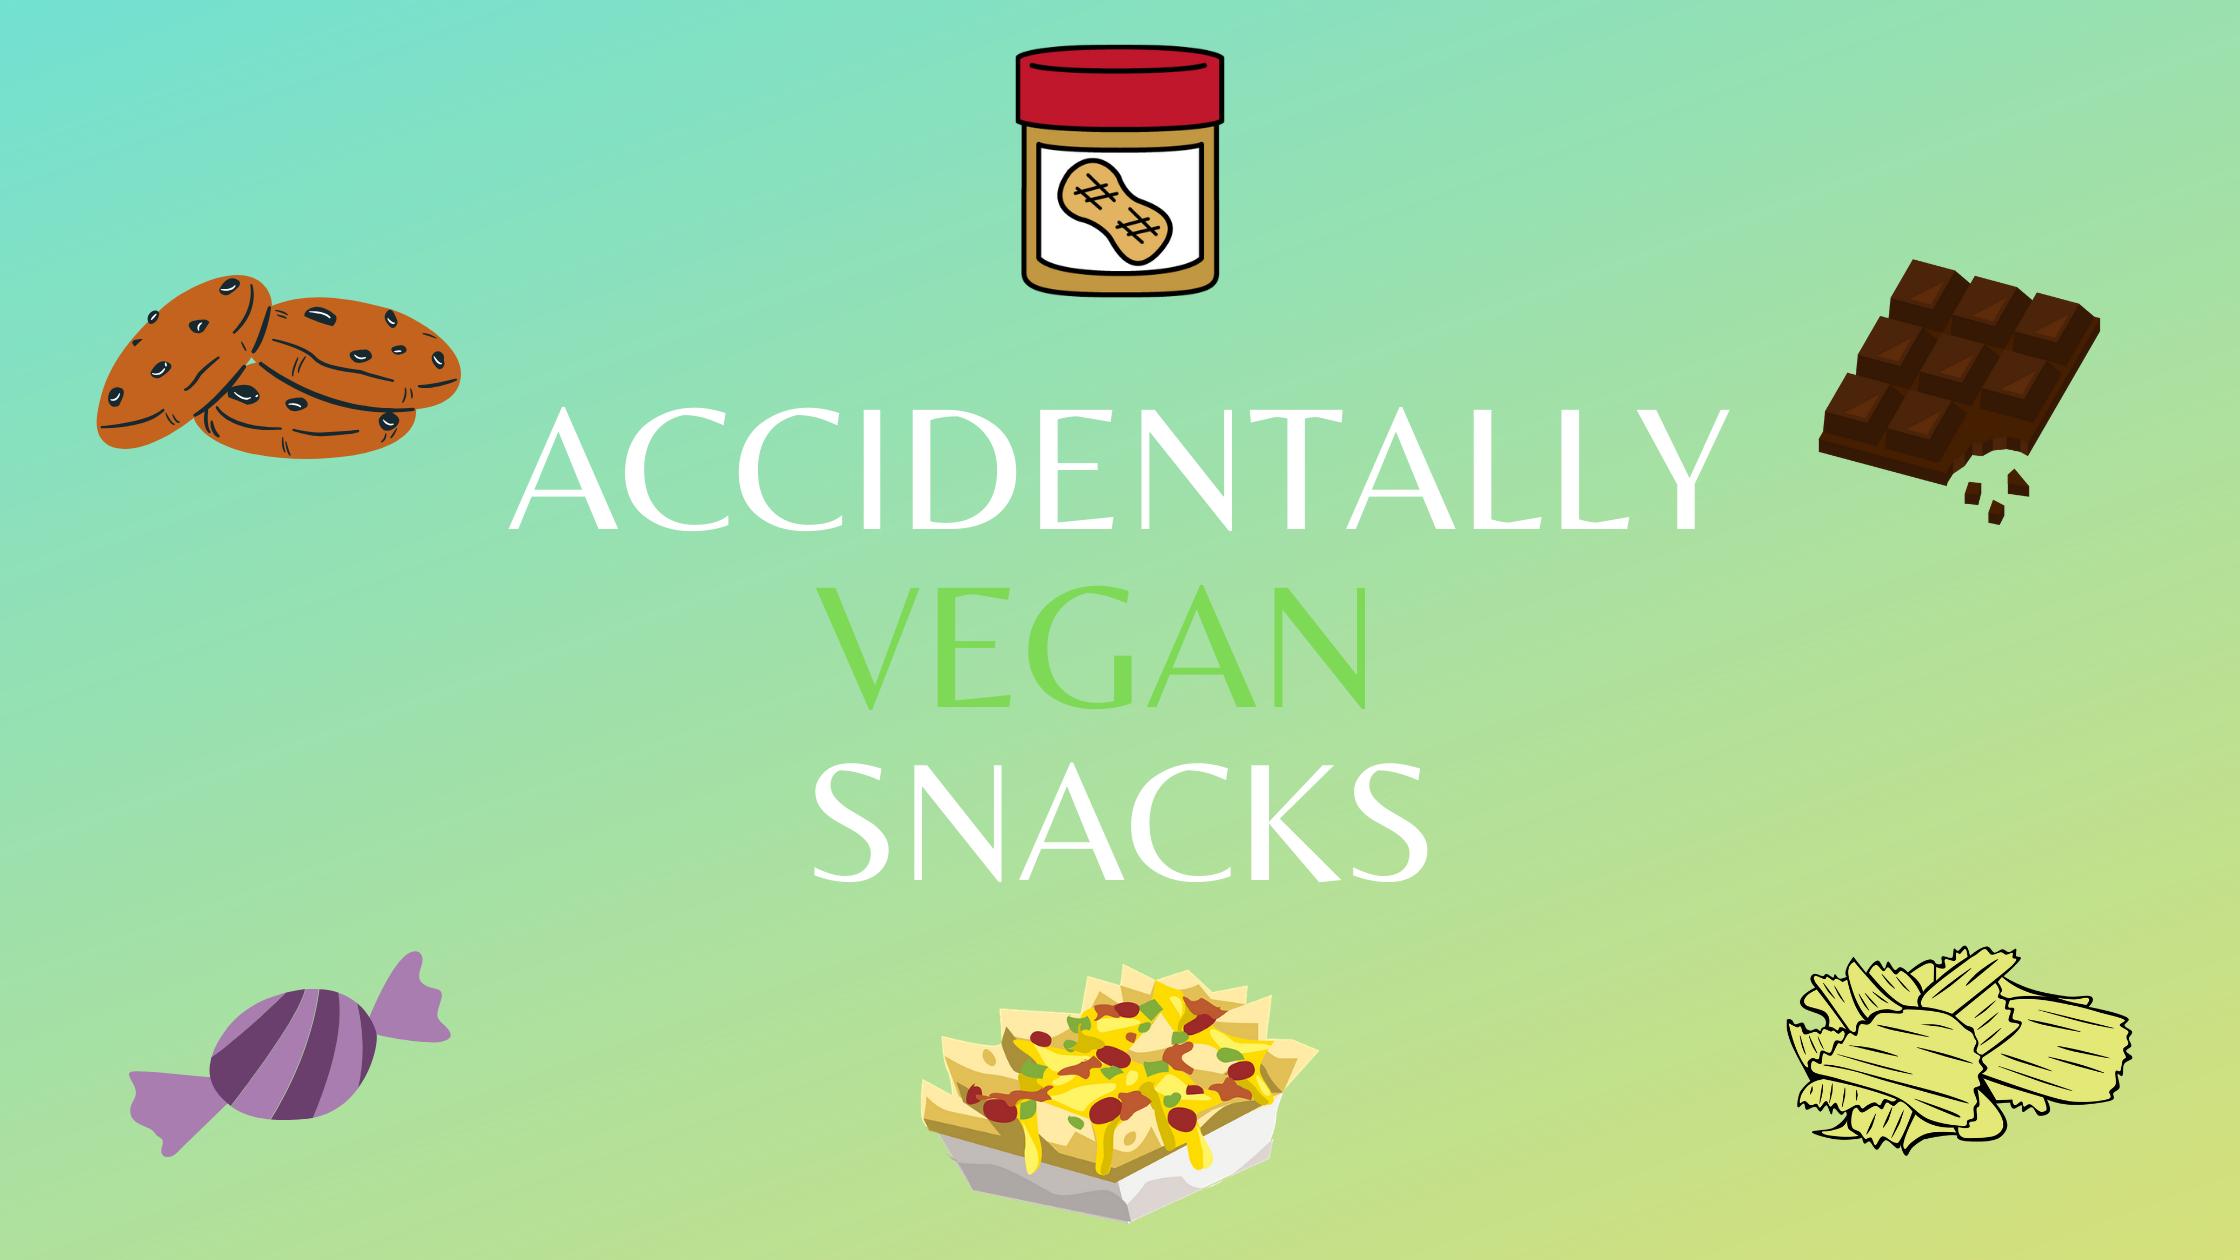 accidentally vegan snacks uk blog post cover image